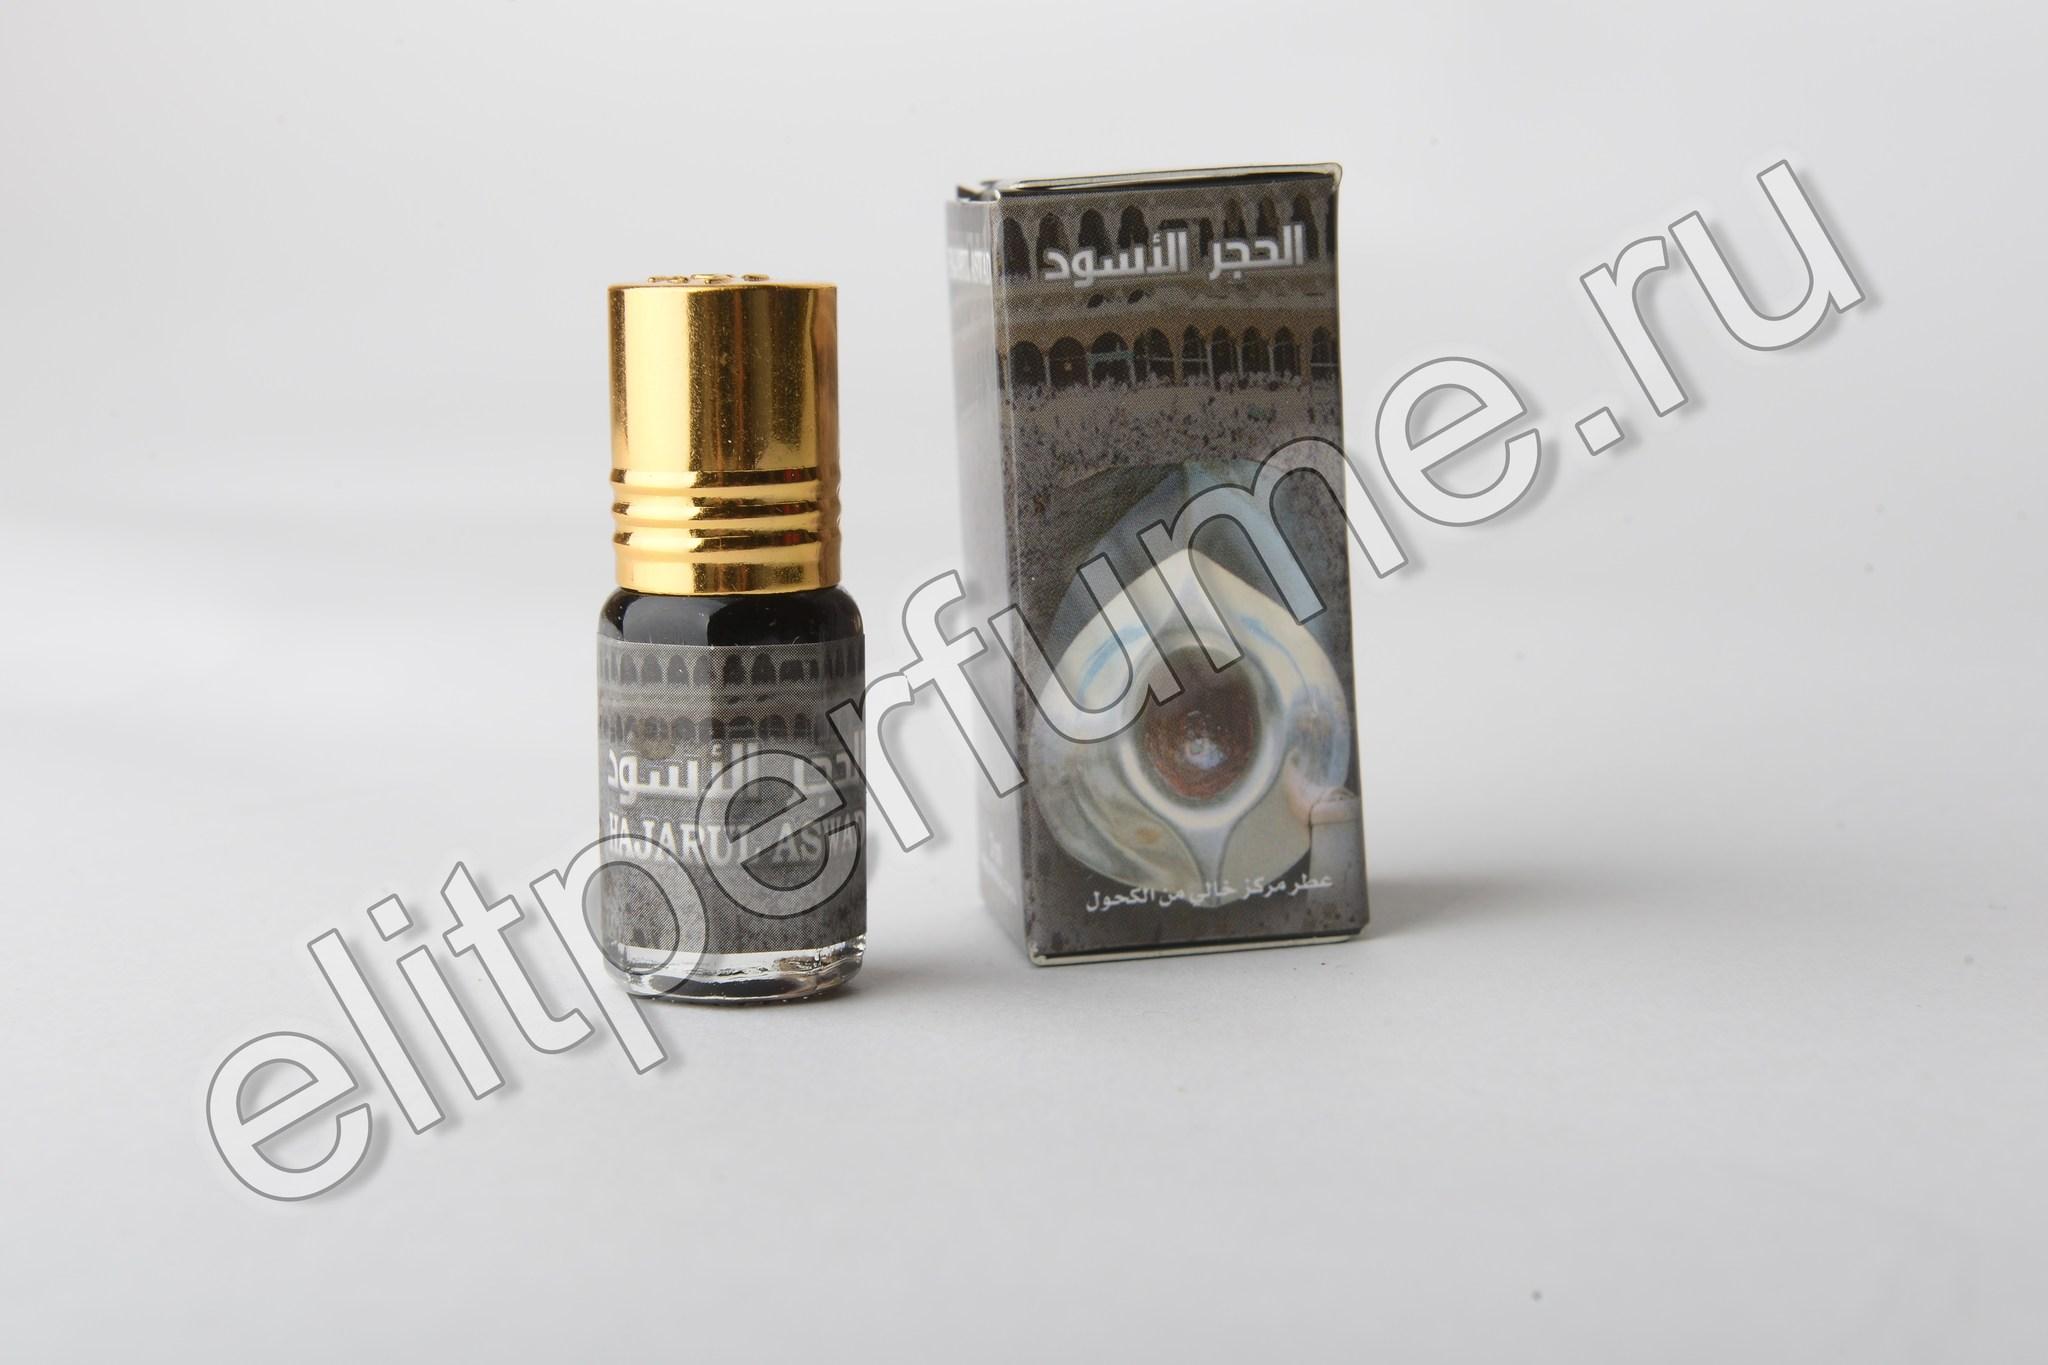 Hajarul Aswad  3 мл арабские масляные духи от Захра Zahra Perfumes